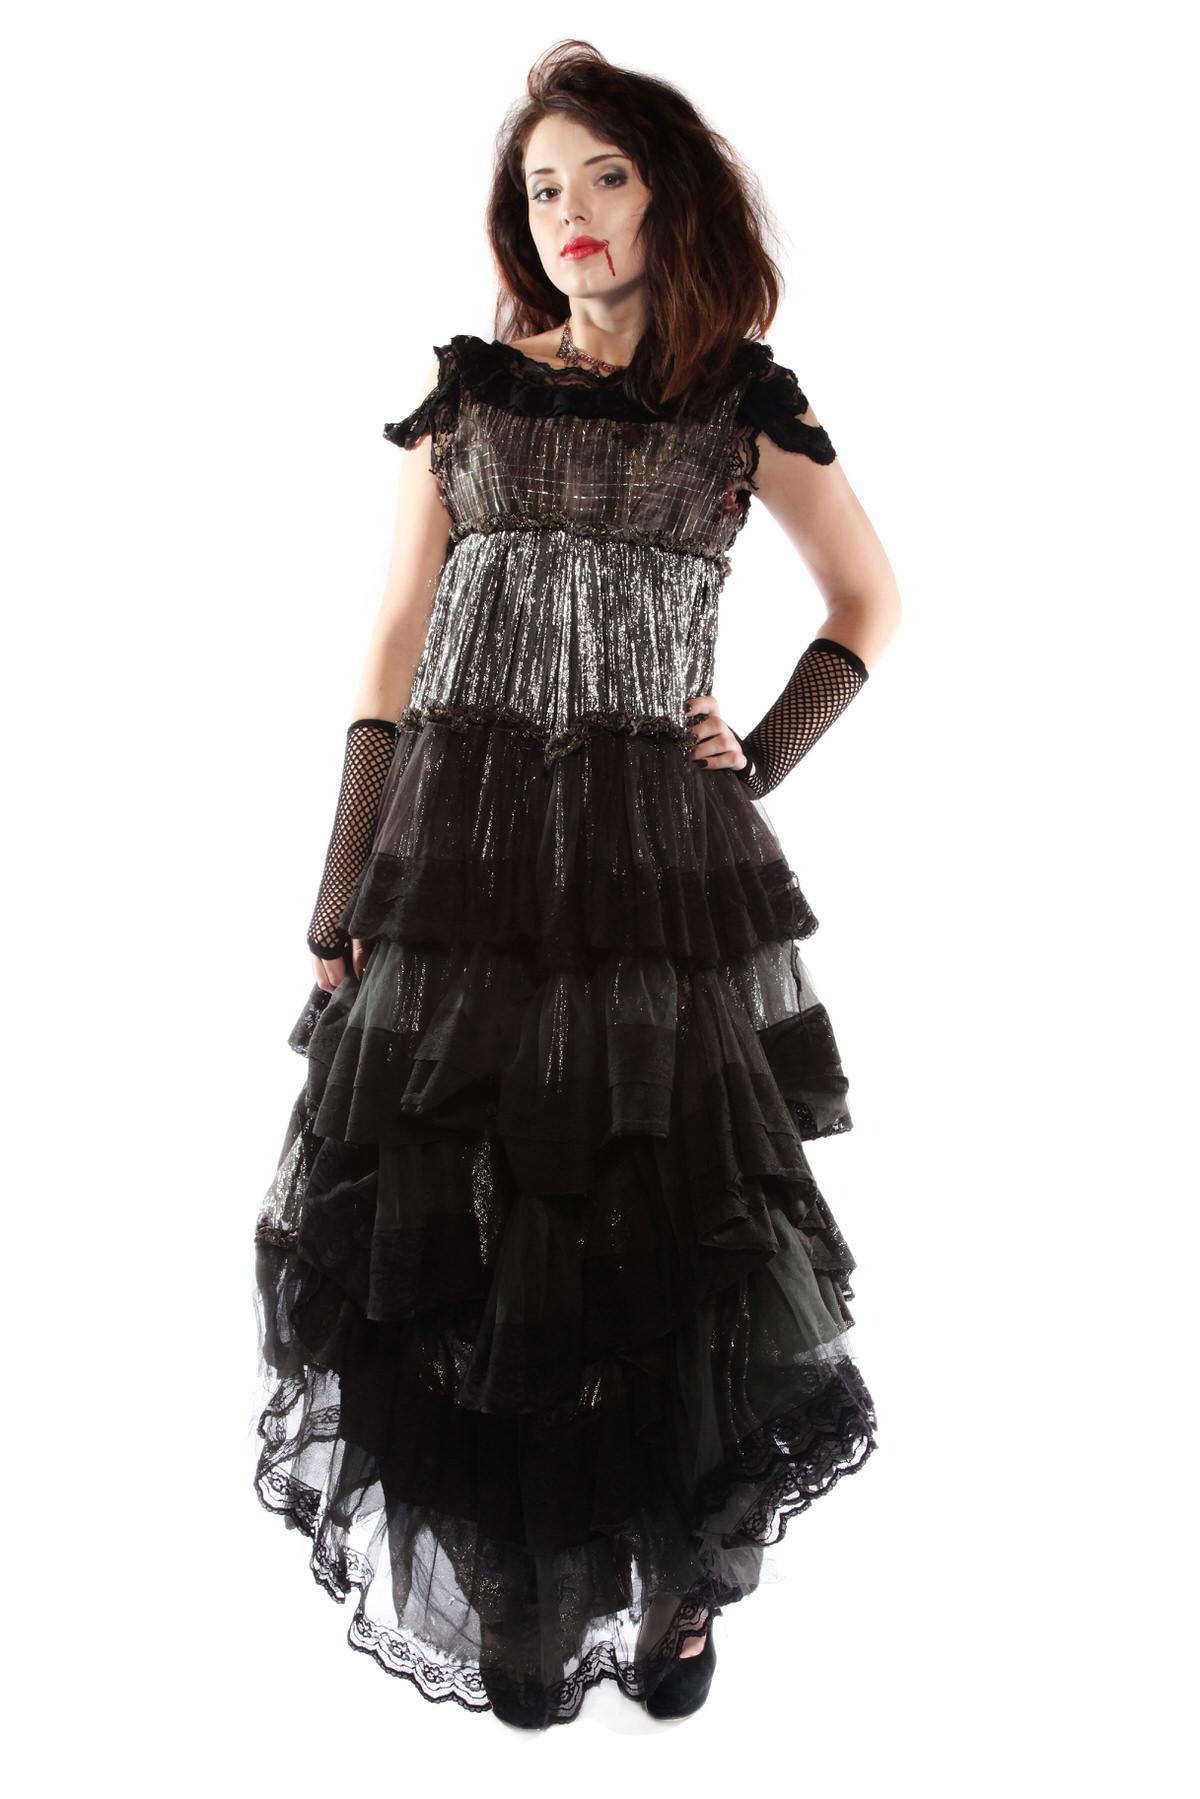 EVIL COUNTESS VINTAGE BLACK DRESS VAMPIRE COSTUME